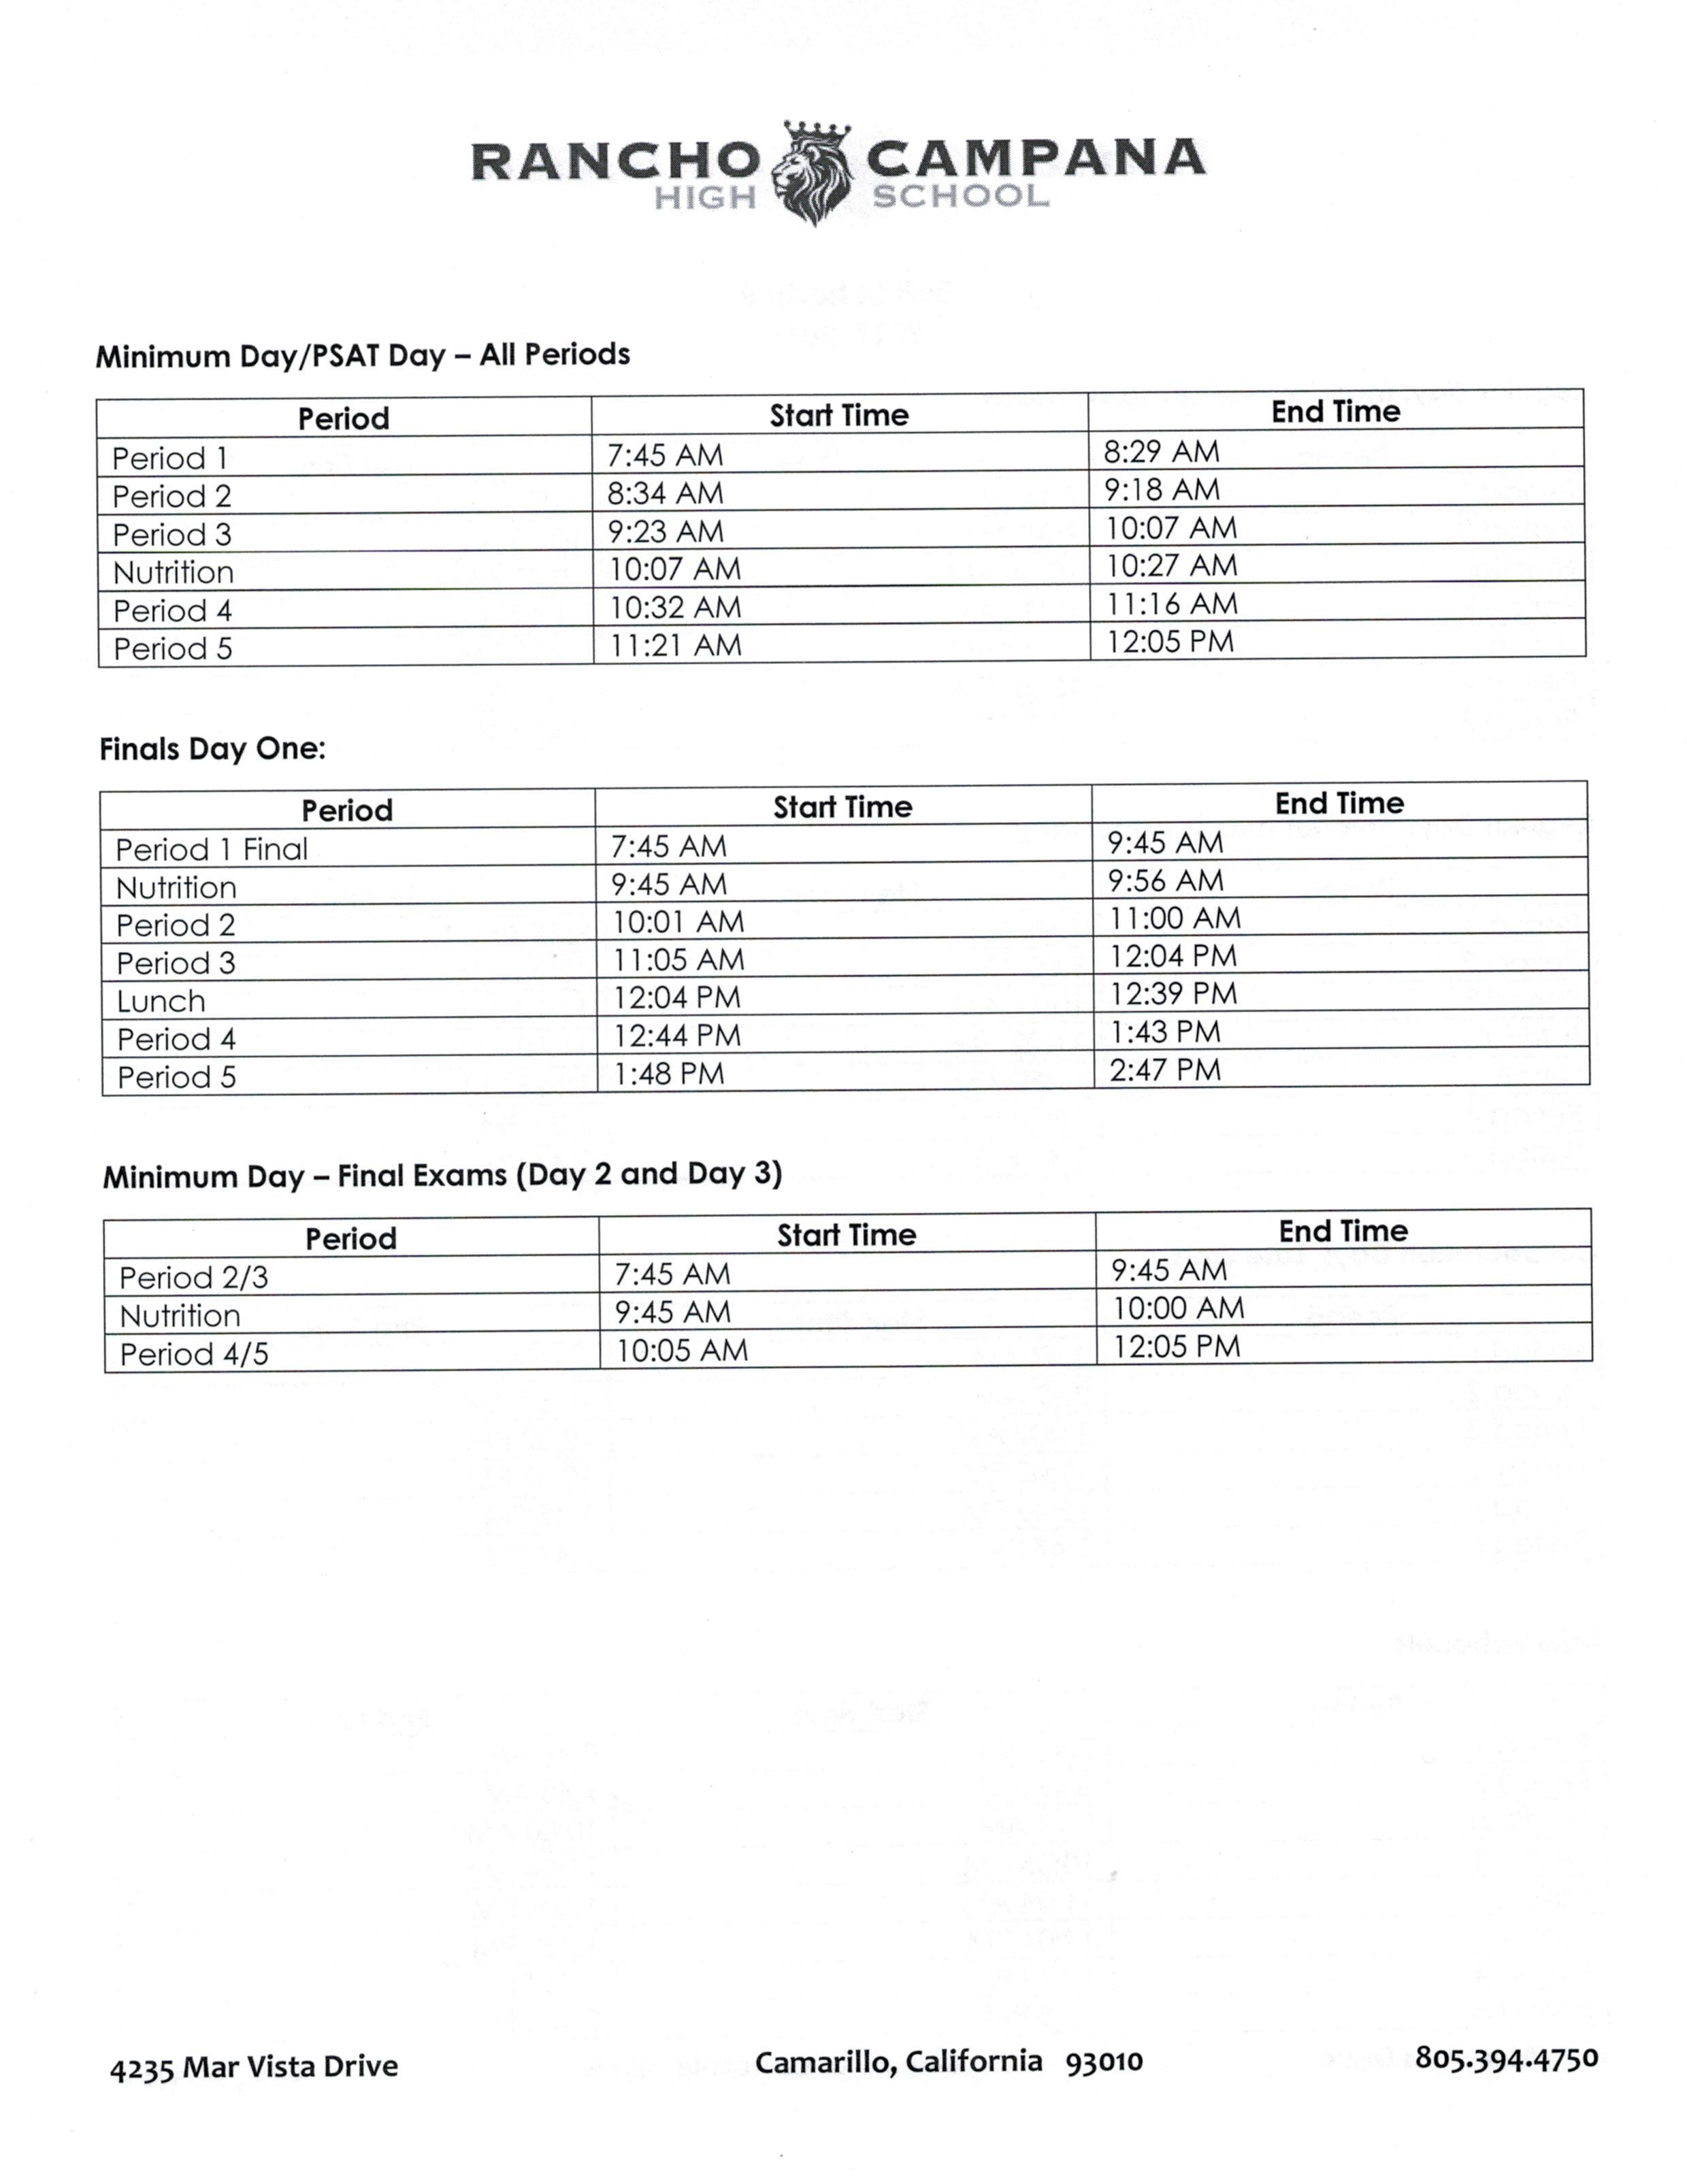 2017 – 2018 School Calendar and Bell Schedules